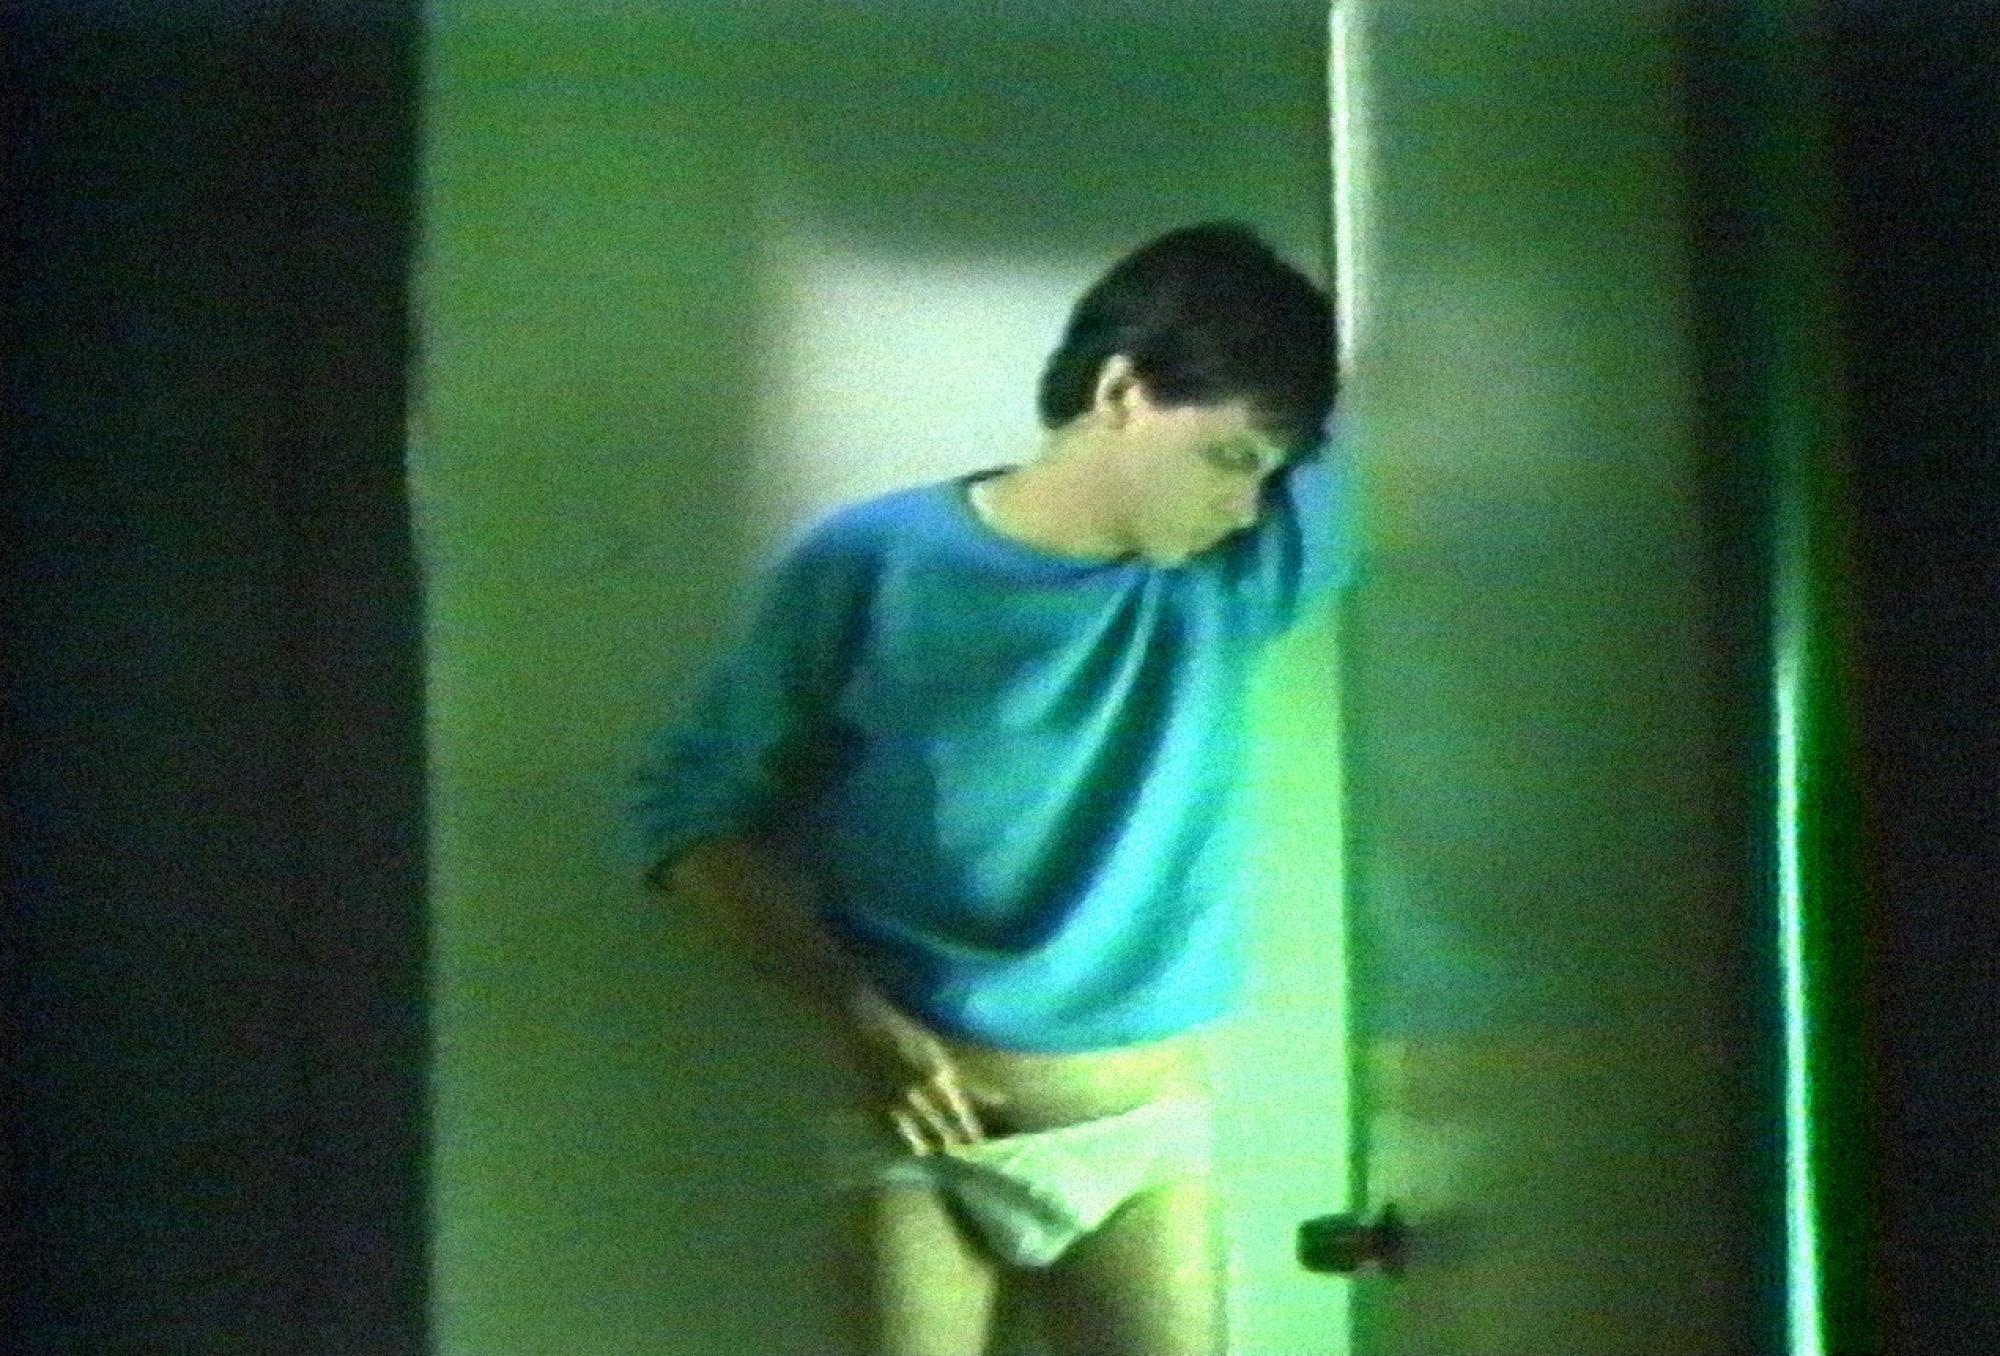 [ Fig. 03 ] <i>Le voyage de l'ogre / The Path of the Ogre</i> (video still), 1981.